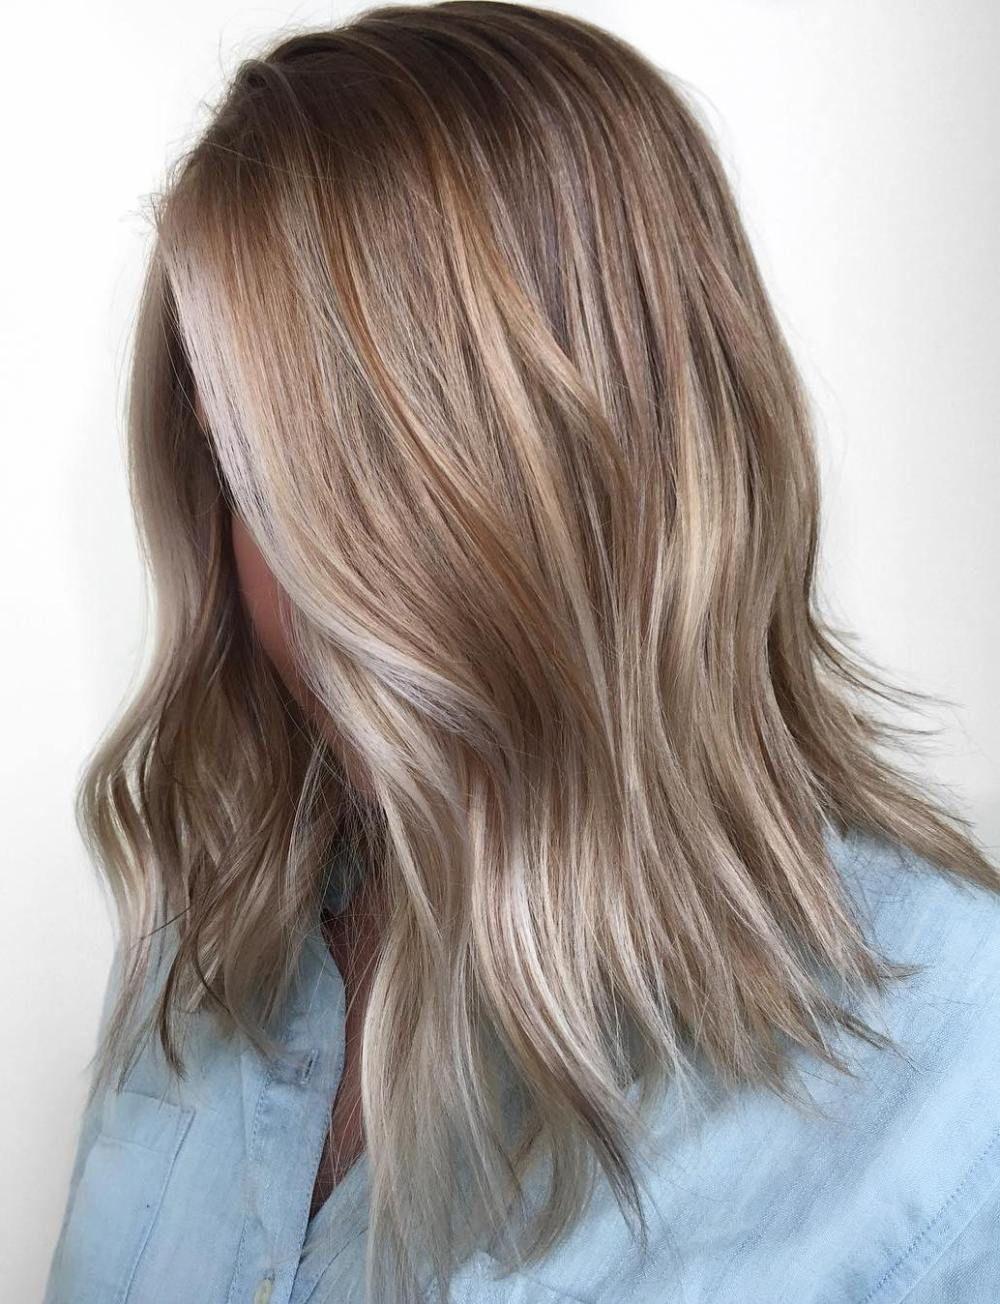 40 Styles With Medium Blonde Hair For Major Inspiration Medium